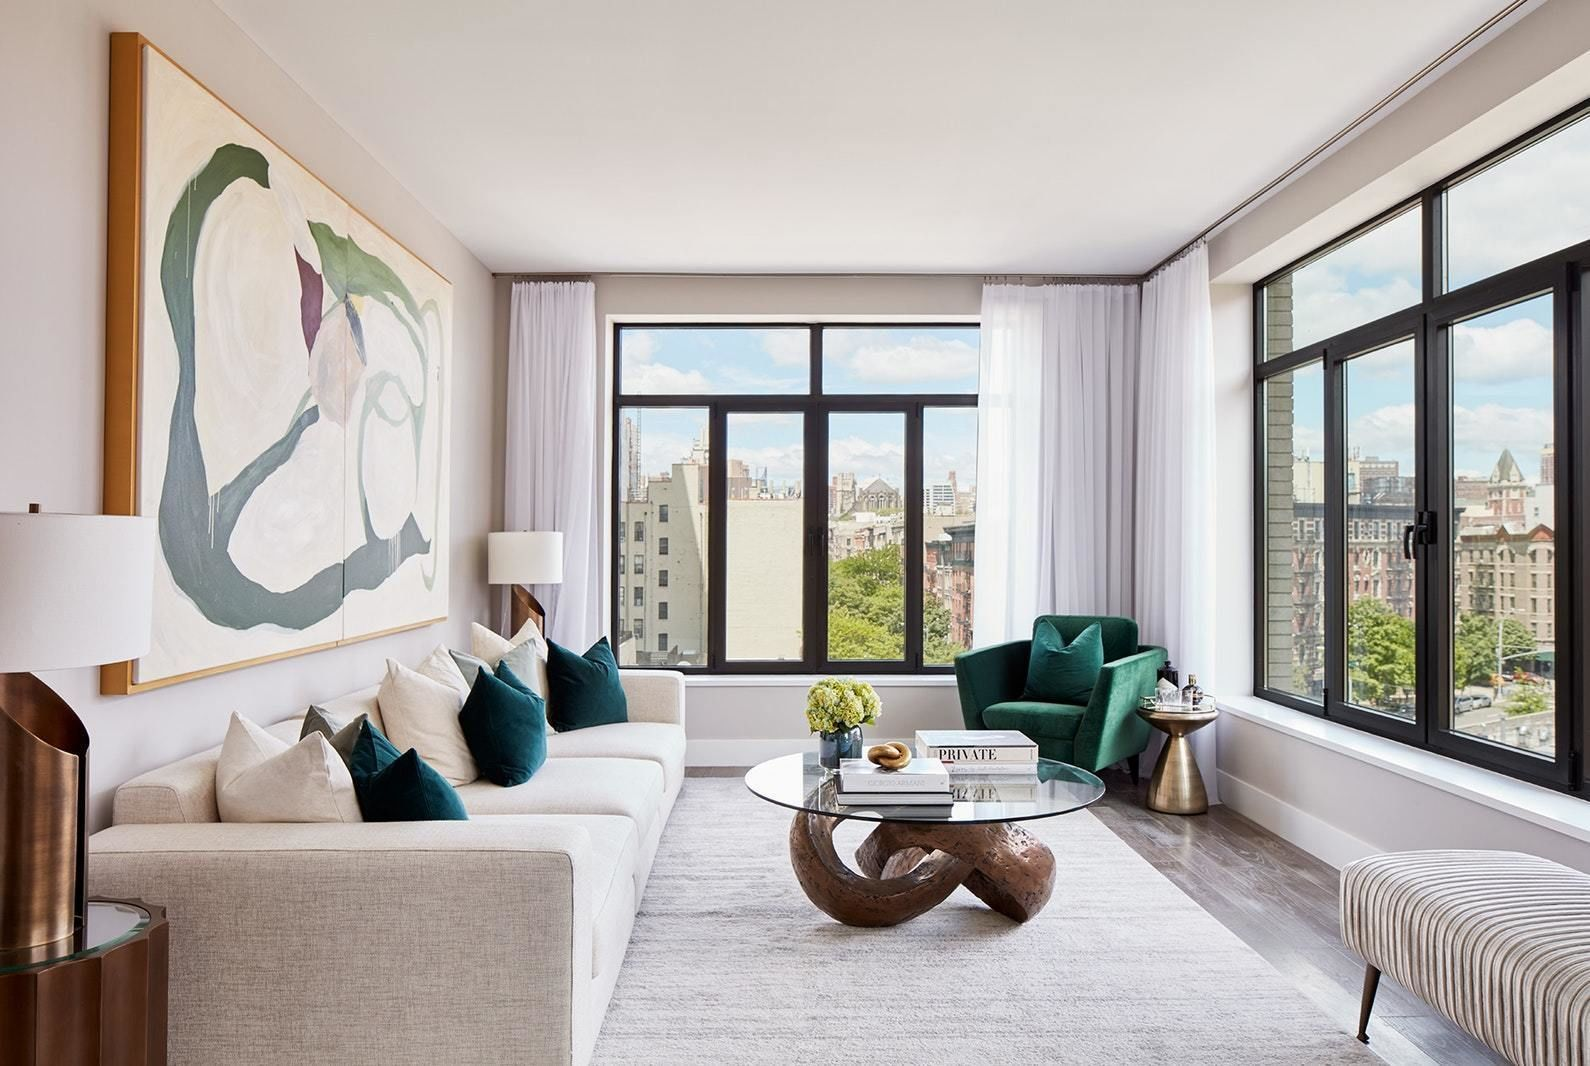 Apartment for sale at 10 Lenox Avenue, Apt 3A